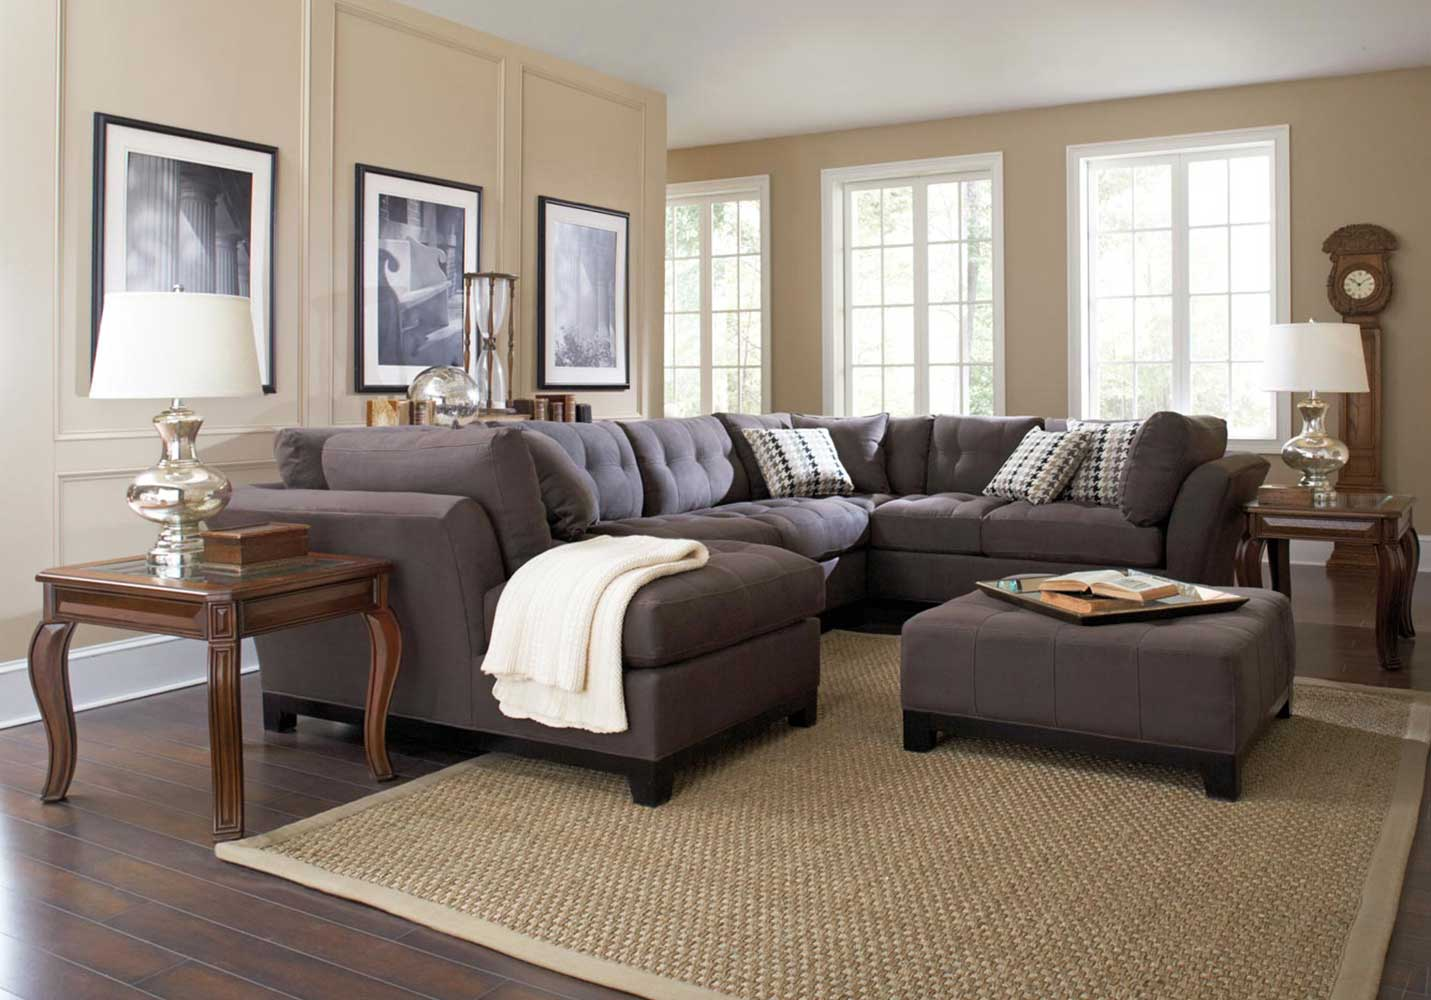 american signature living room sets black leather furniture bassett